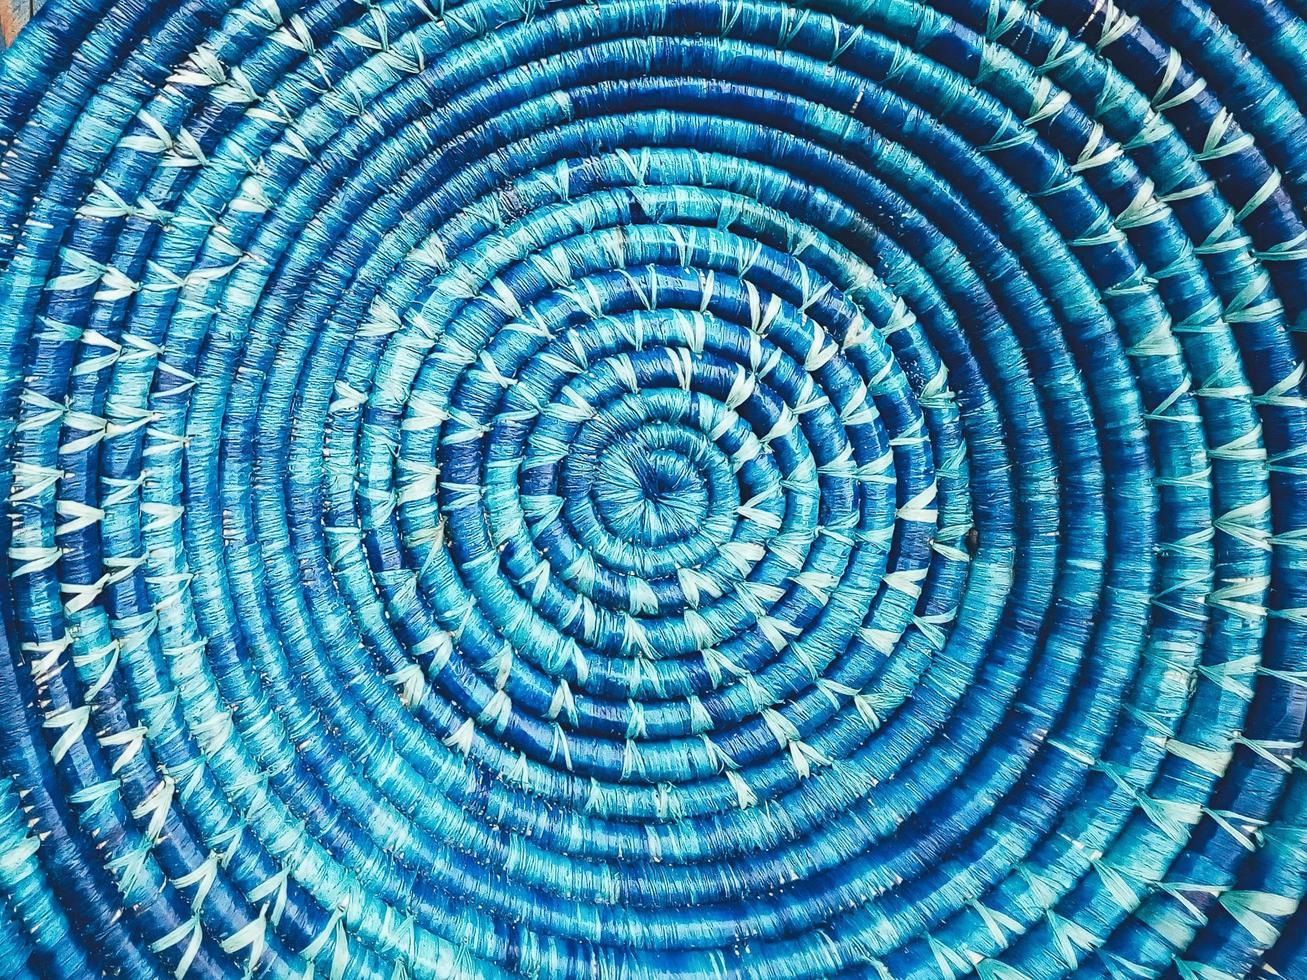 blauer Korb runder Teller closeup foto